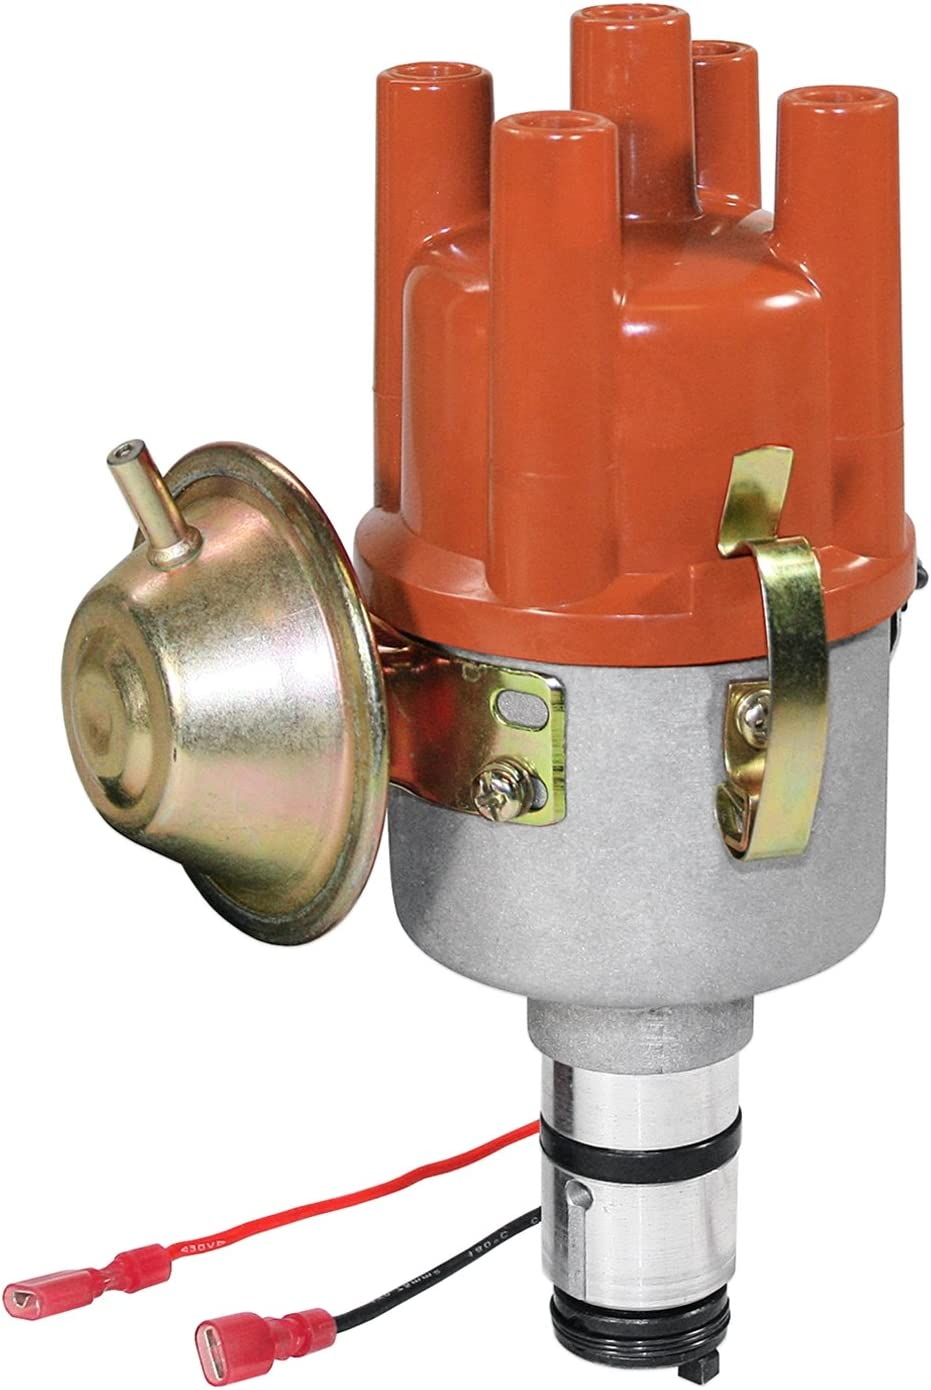 Kuhltek Motorwerks 0231170034EL Vacuum Advance Distributor with Electronic Ignition for VW Beetle